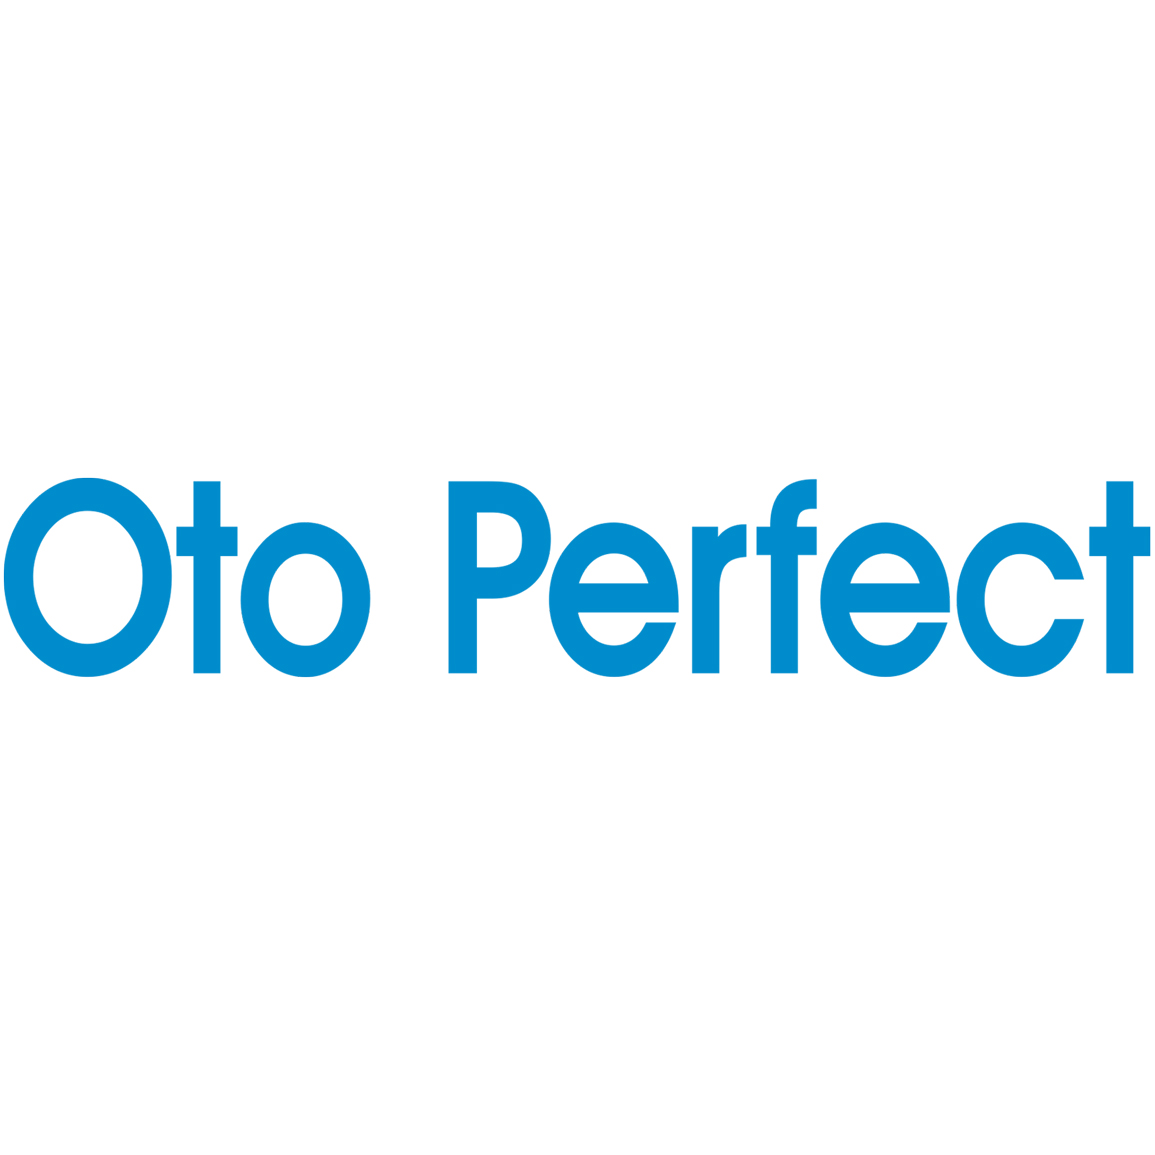 Oto Perfect Logo 1155x1155px